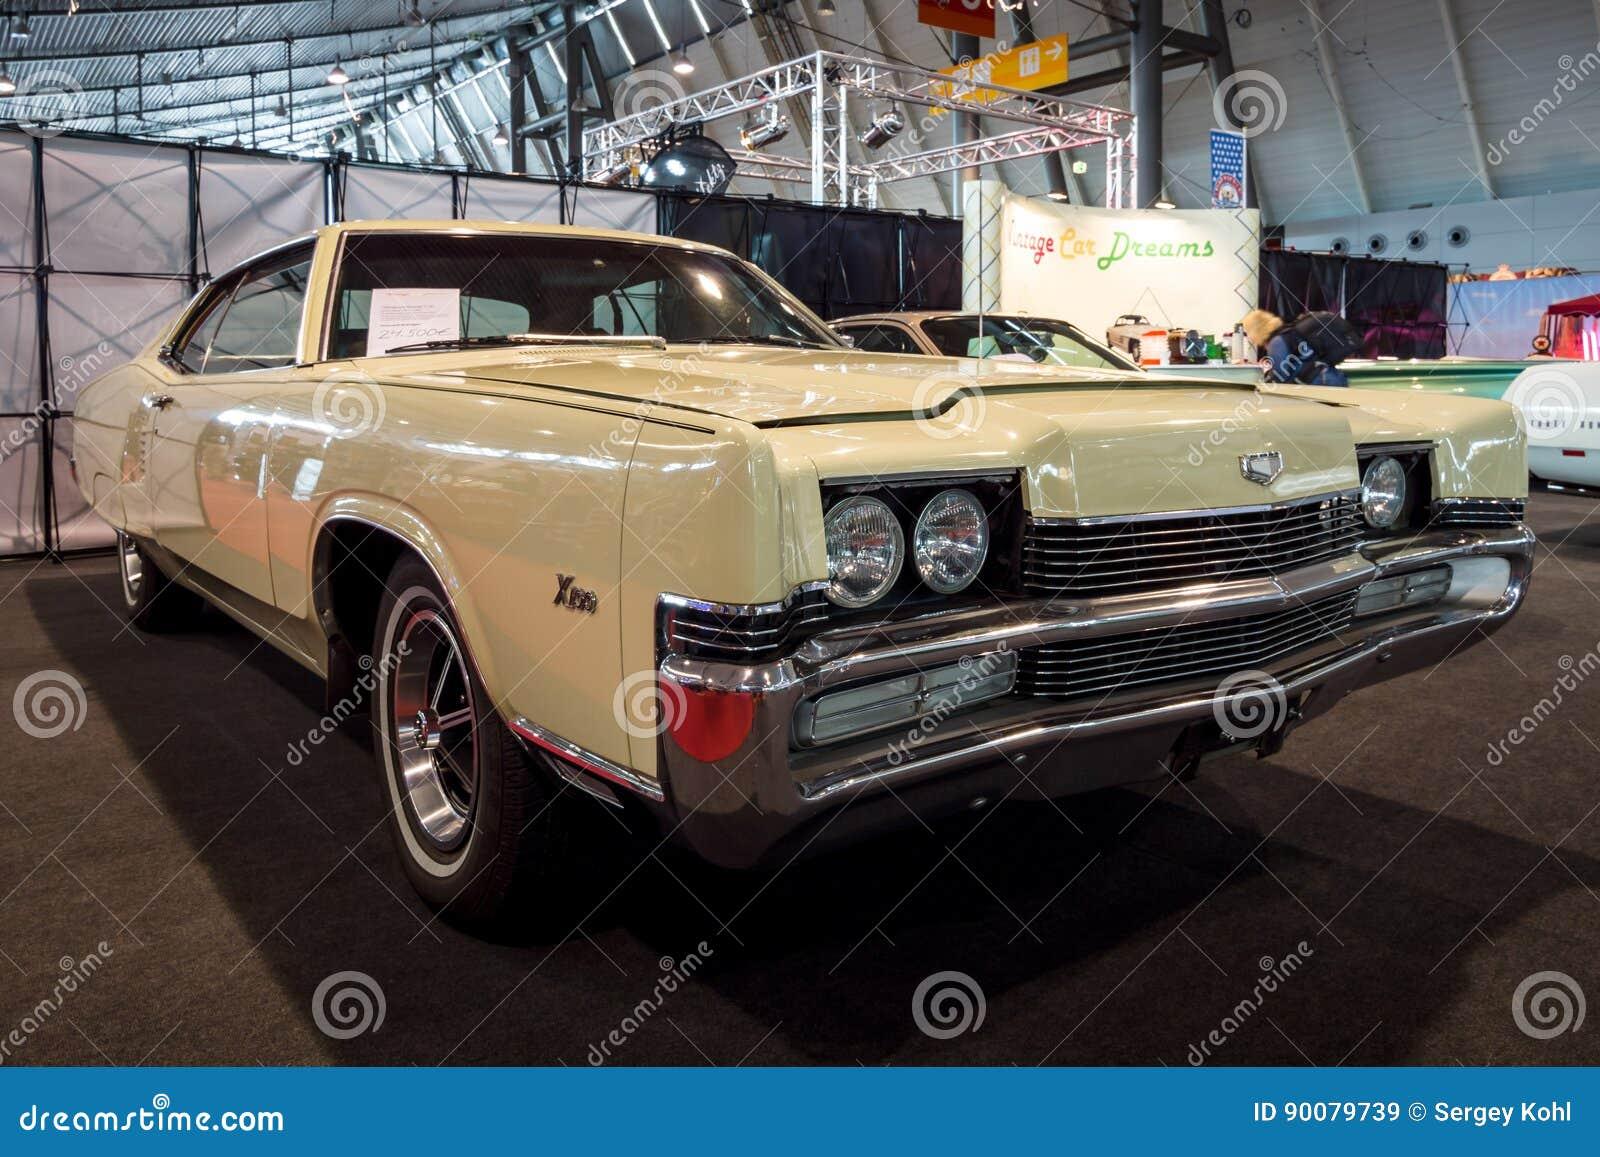 1969 mercury cougar 428 cobra jet engine royalty